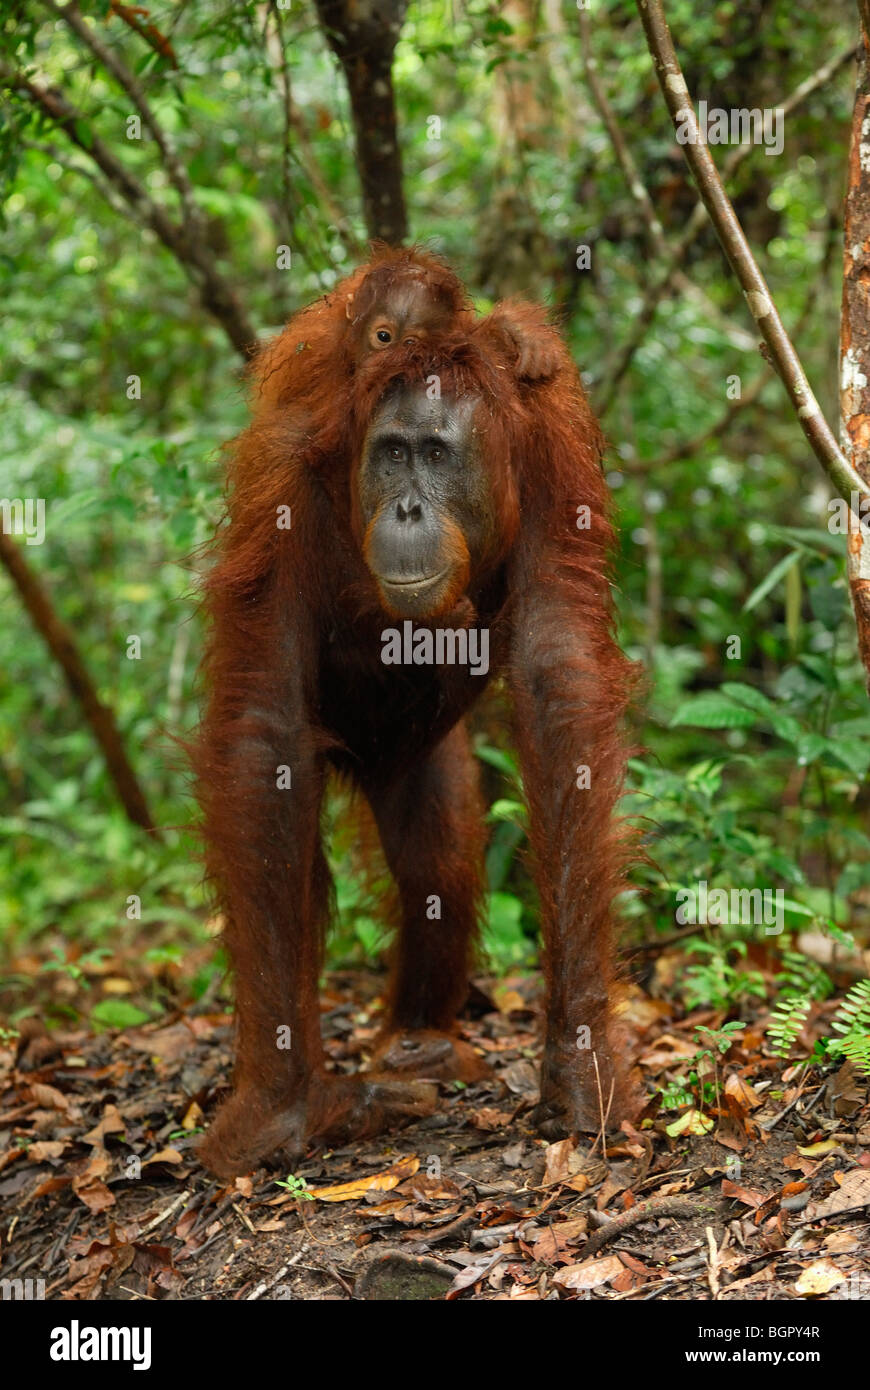 Borneo Orangutan (Pongo pygmaeus), female with its baby riding on its back, Kalimantan, Borneo, Indonesia - Stock Image